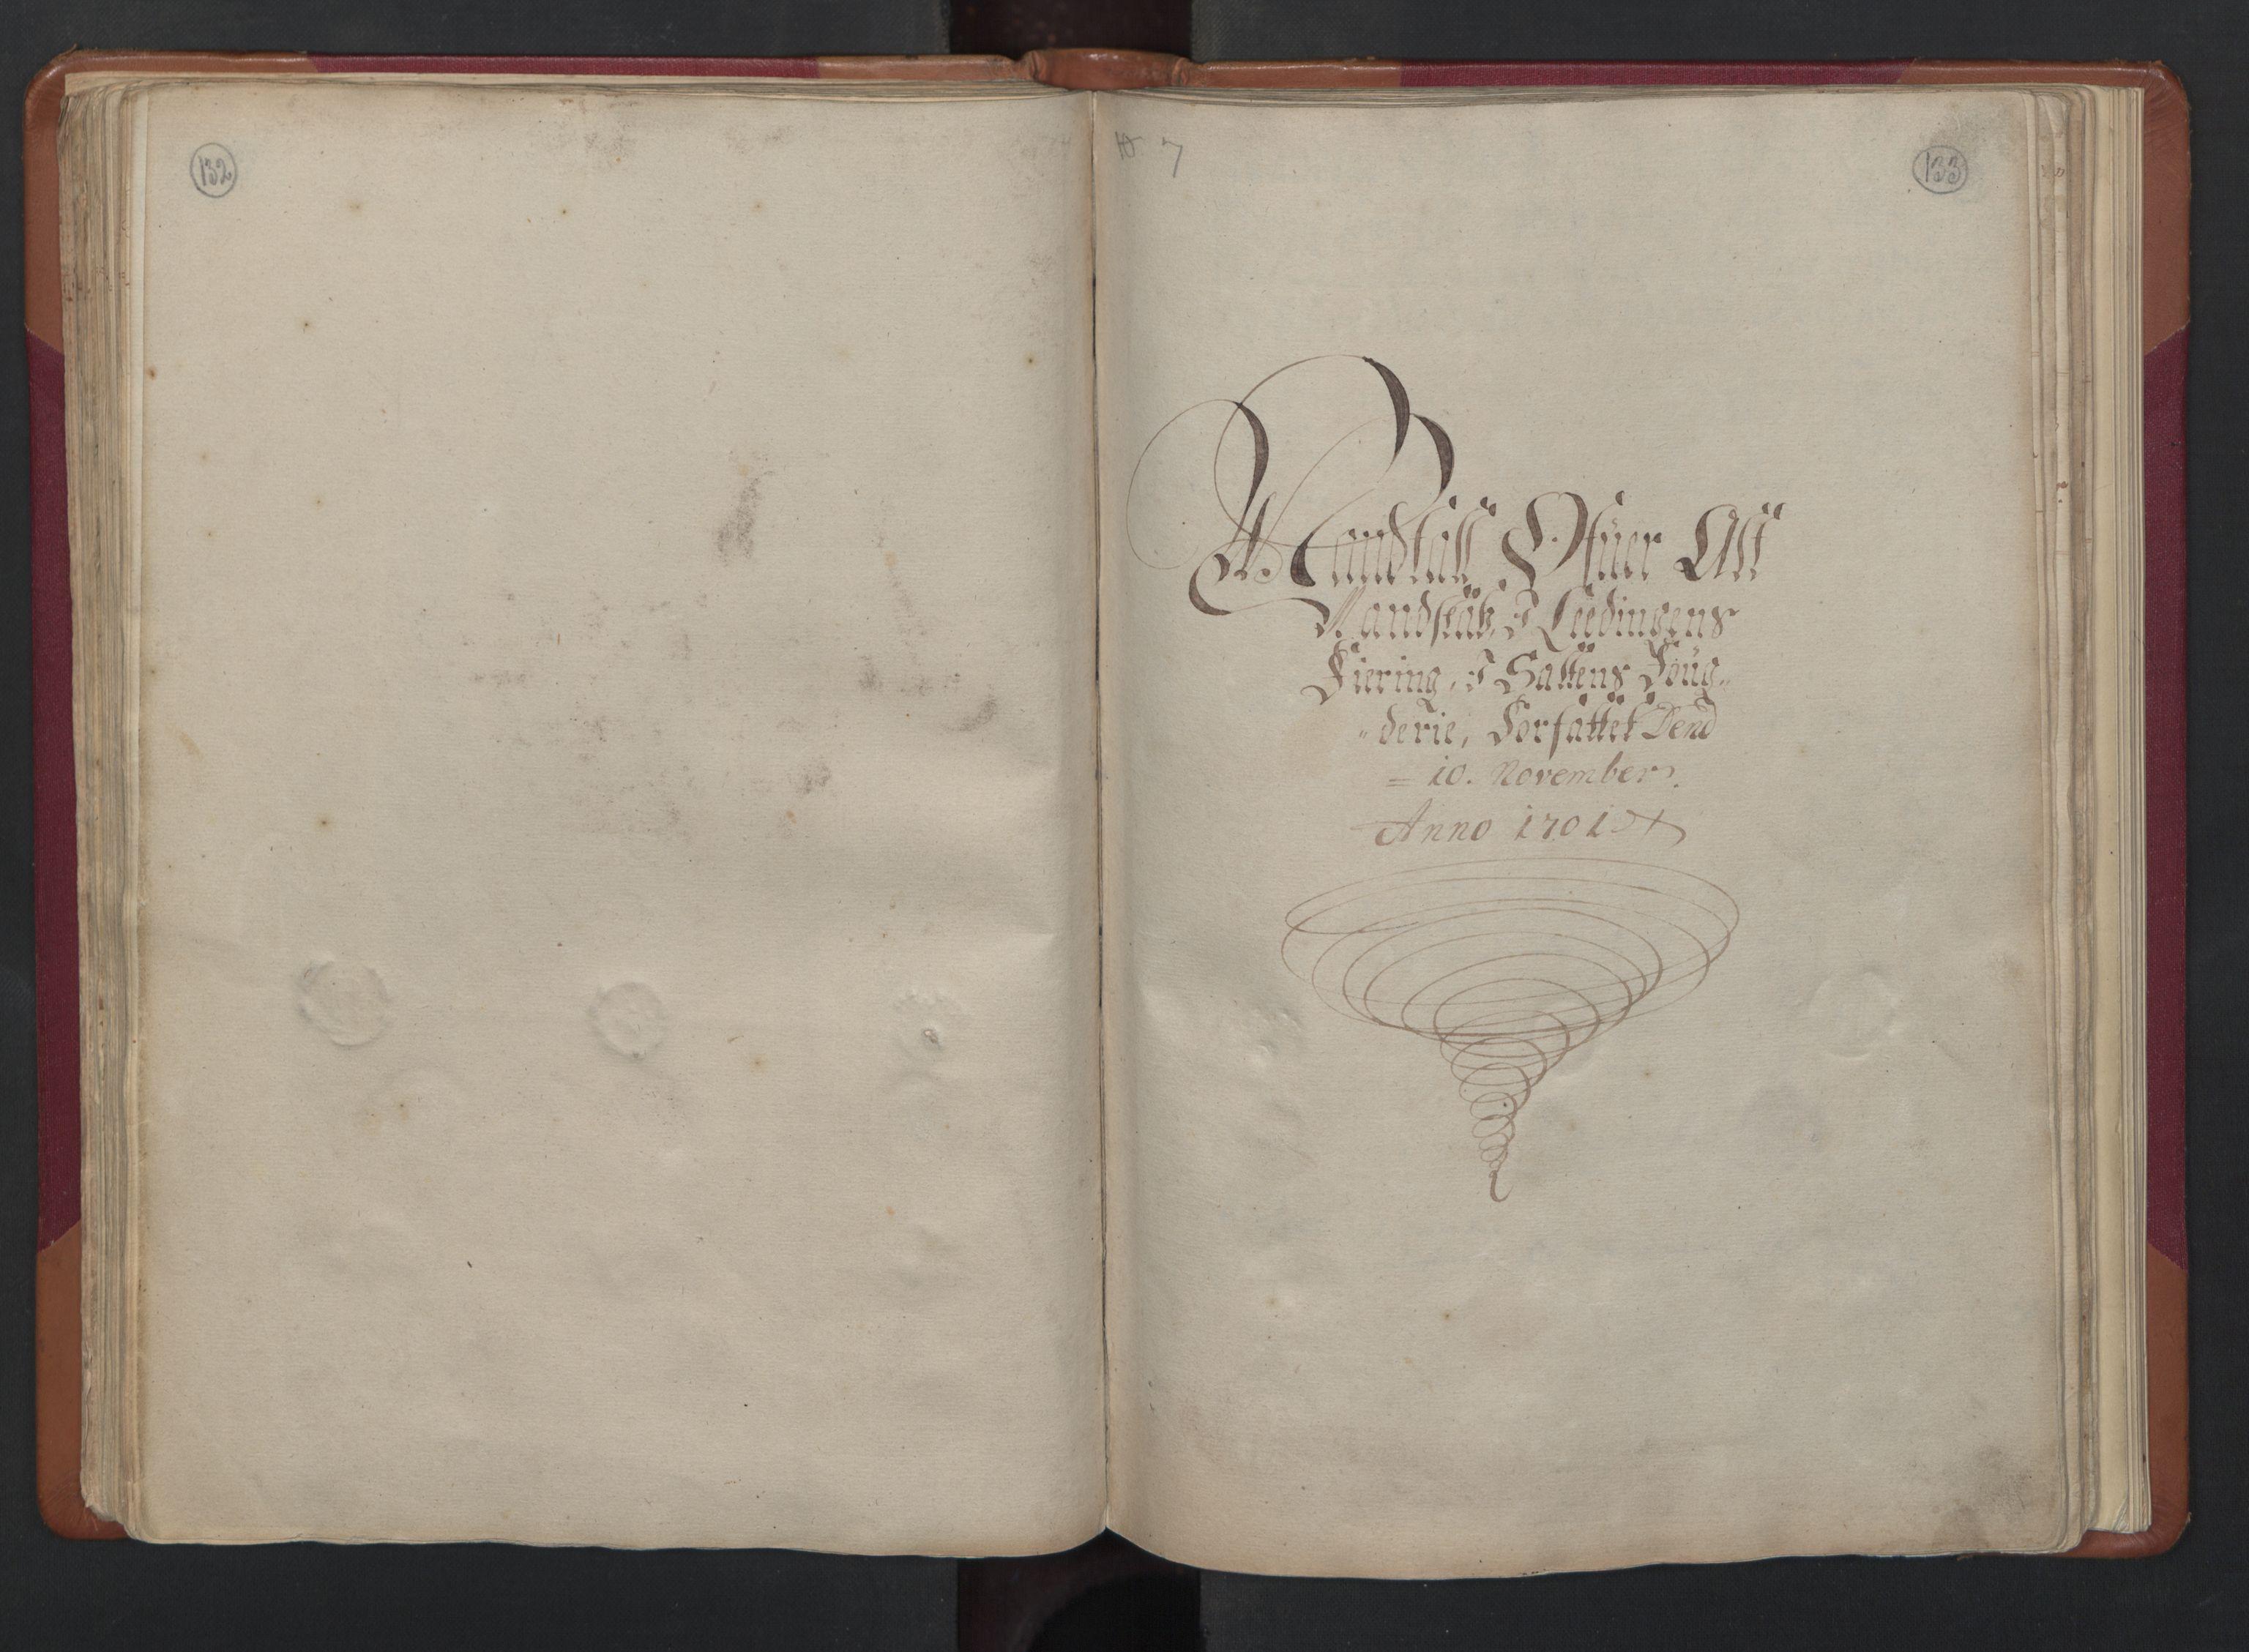 RA, Manntallet 1701, nr. 17: Salten fogderi, 1701, s. 132-133